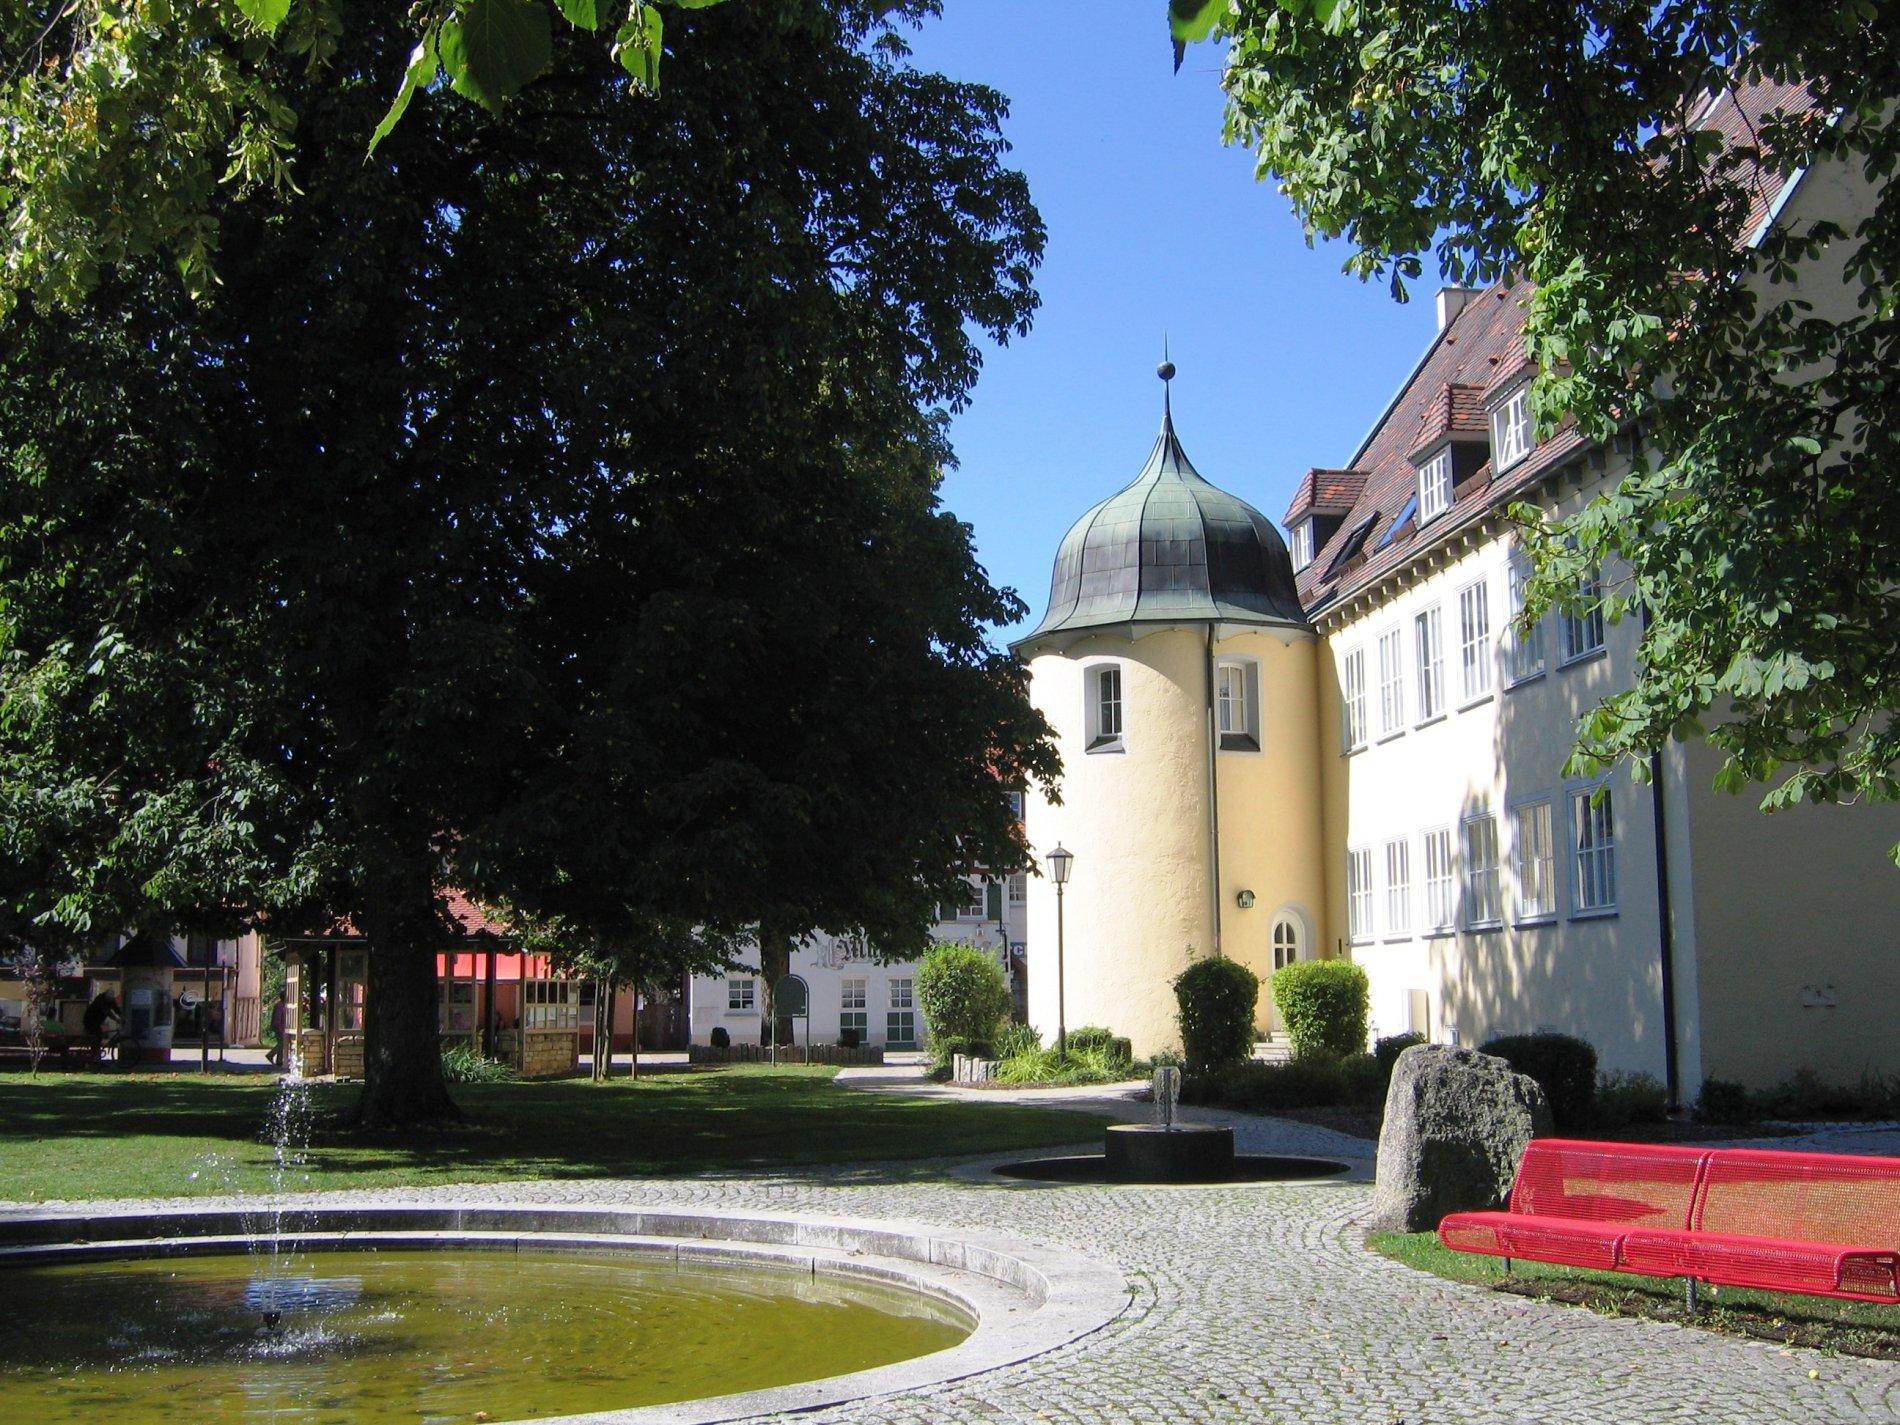 Winterlinger Rathauspark